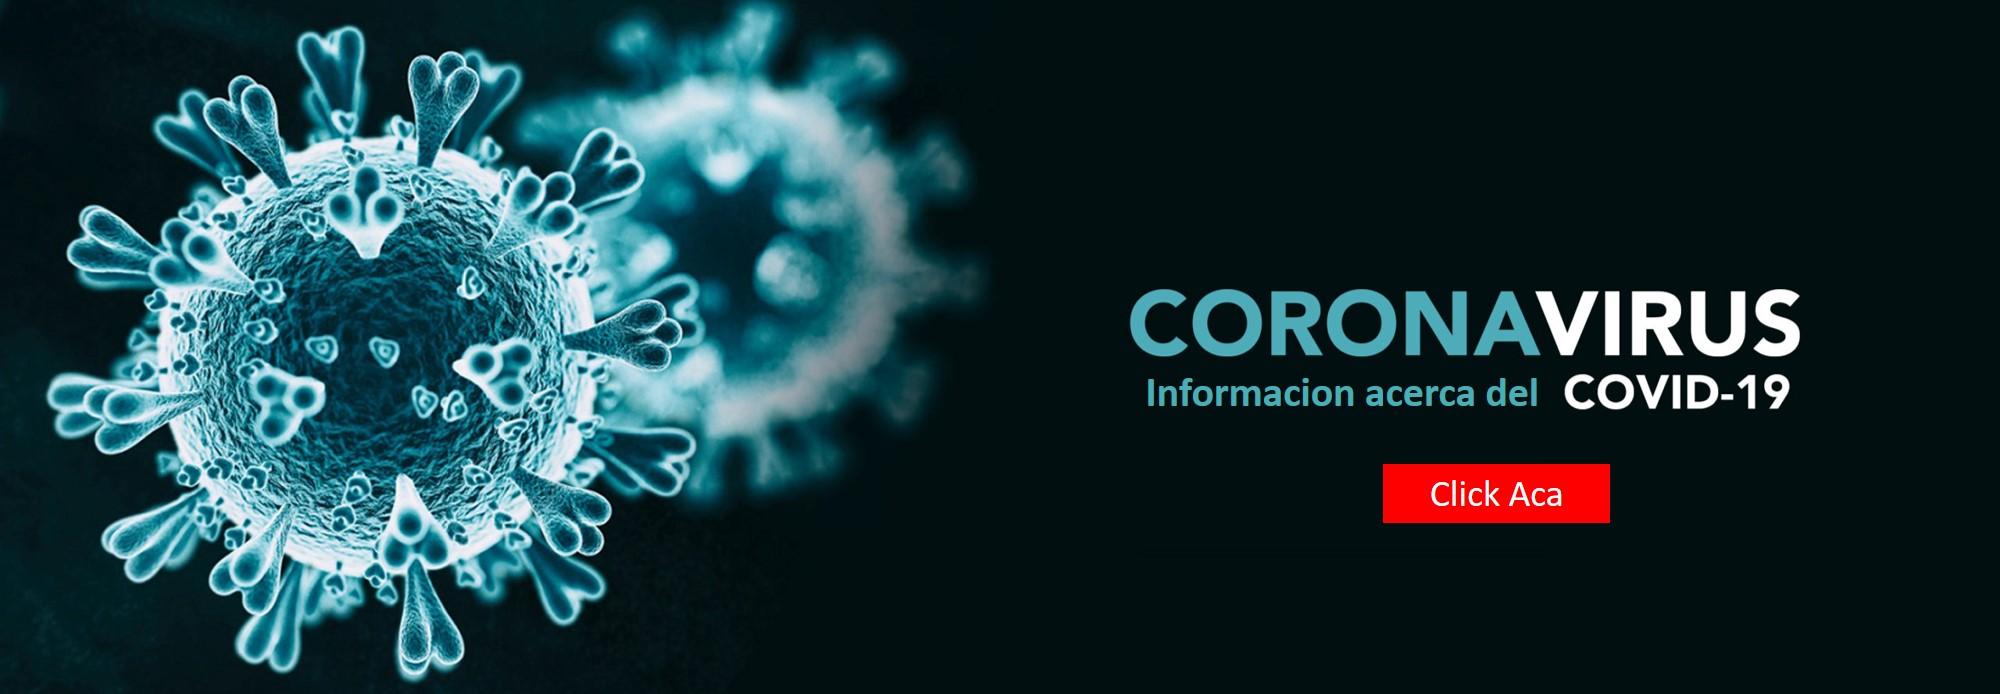 CoronaVirys Colombia